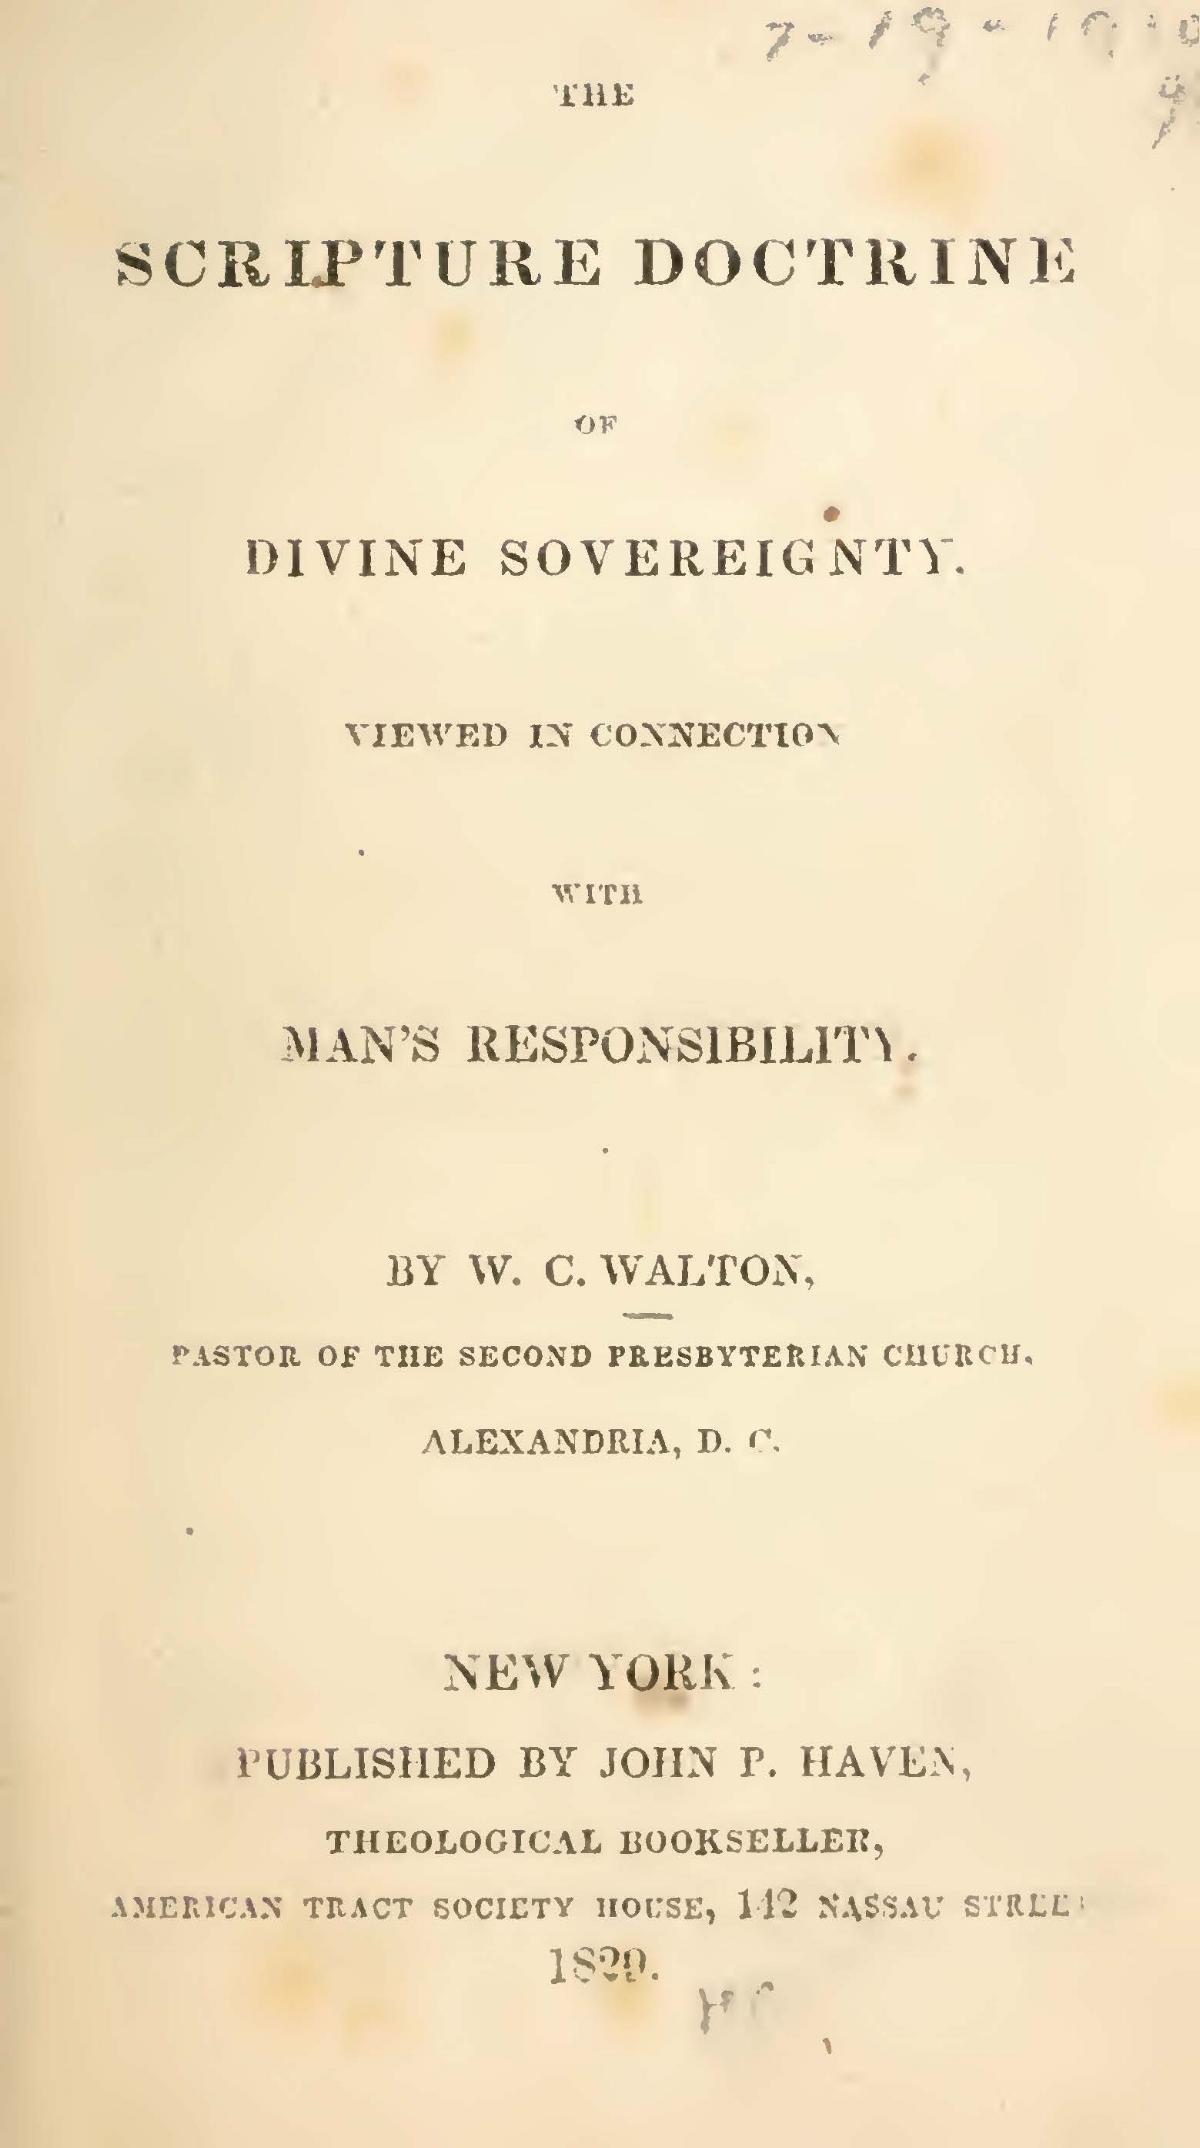 Walton, William Claiborne, The Scripture Doctrine of Divine Sovereignty Title Page.jpg